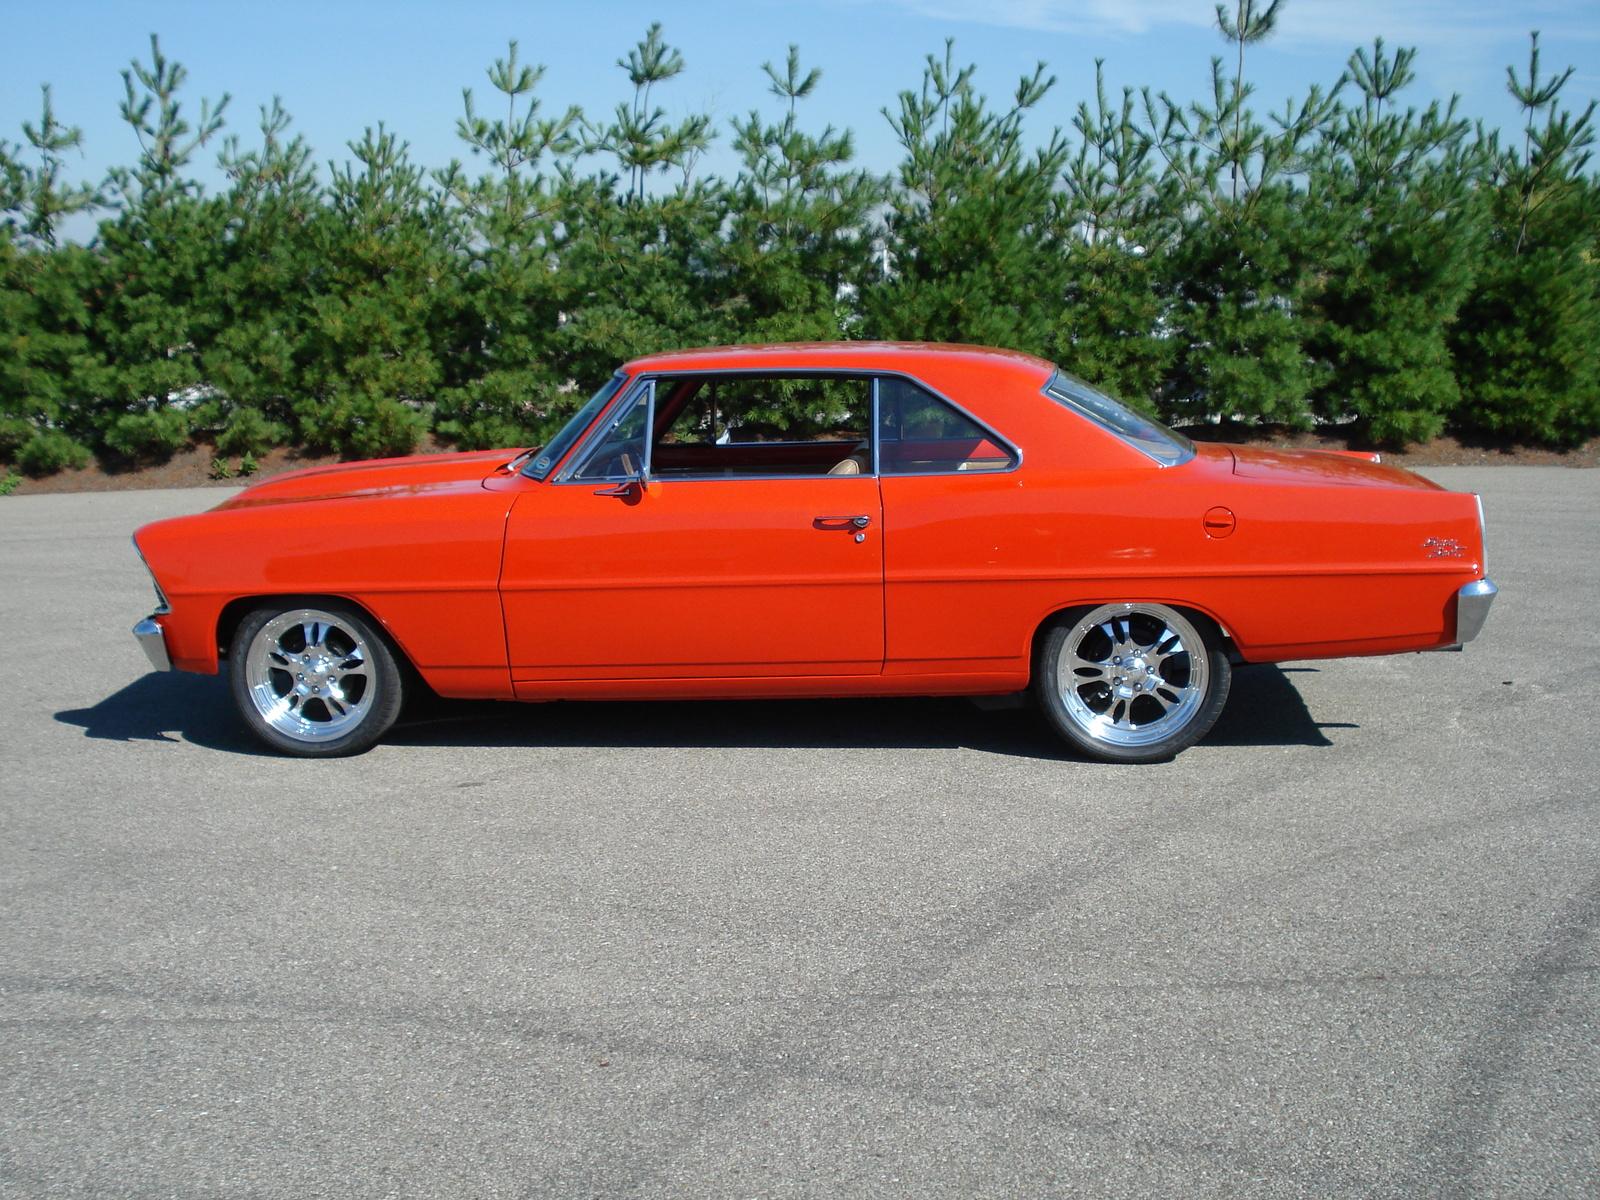 Home » 1967 Chevrolet Nova Ss Used Cars For Sale Carsforsalecom